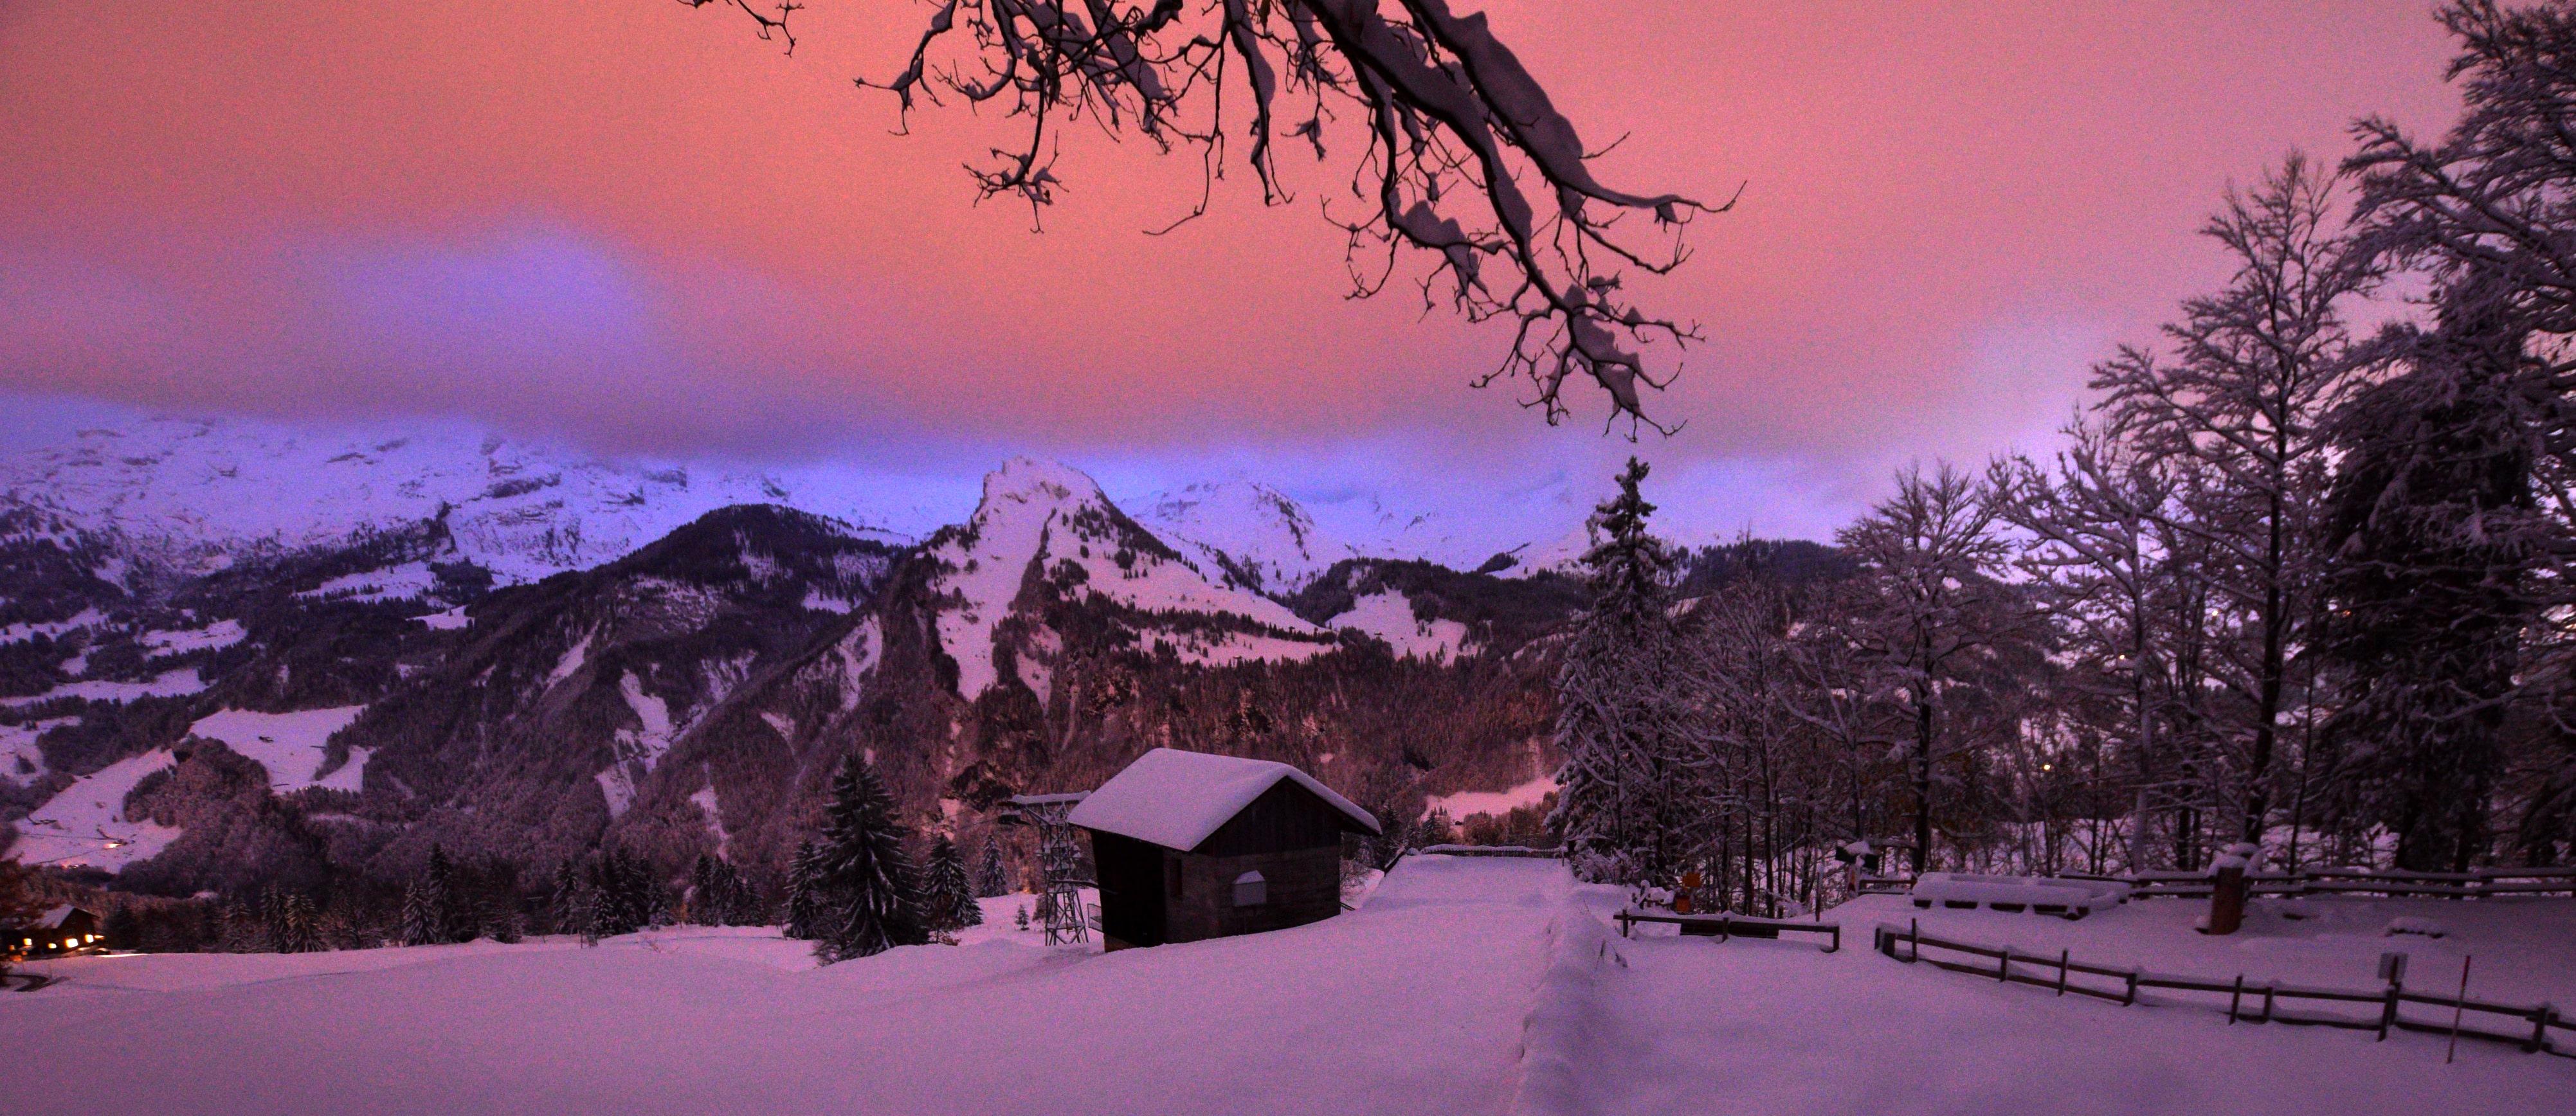 Tourismus Webcam Sonnenuntergang